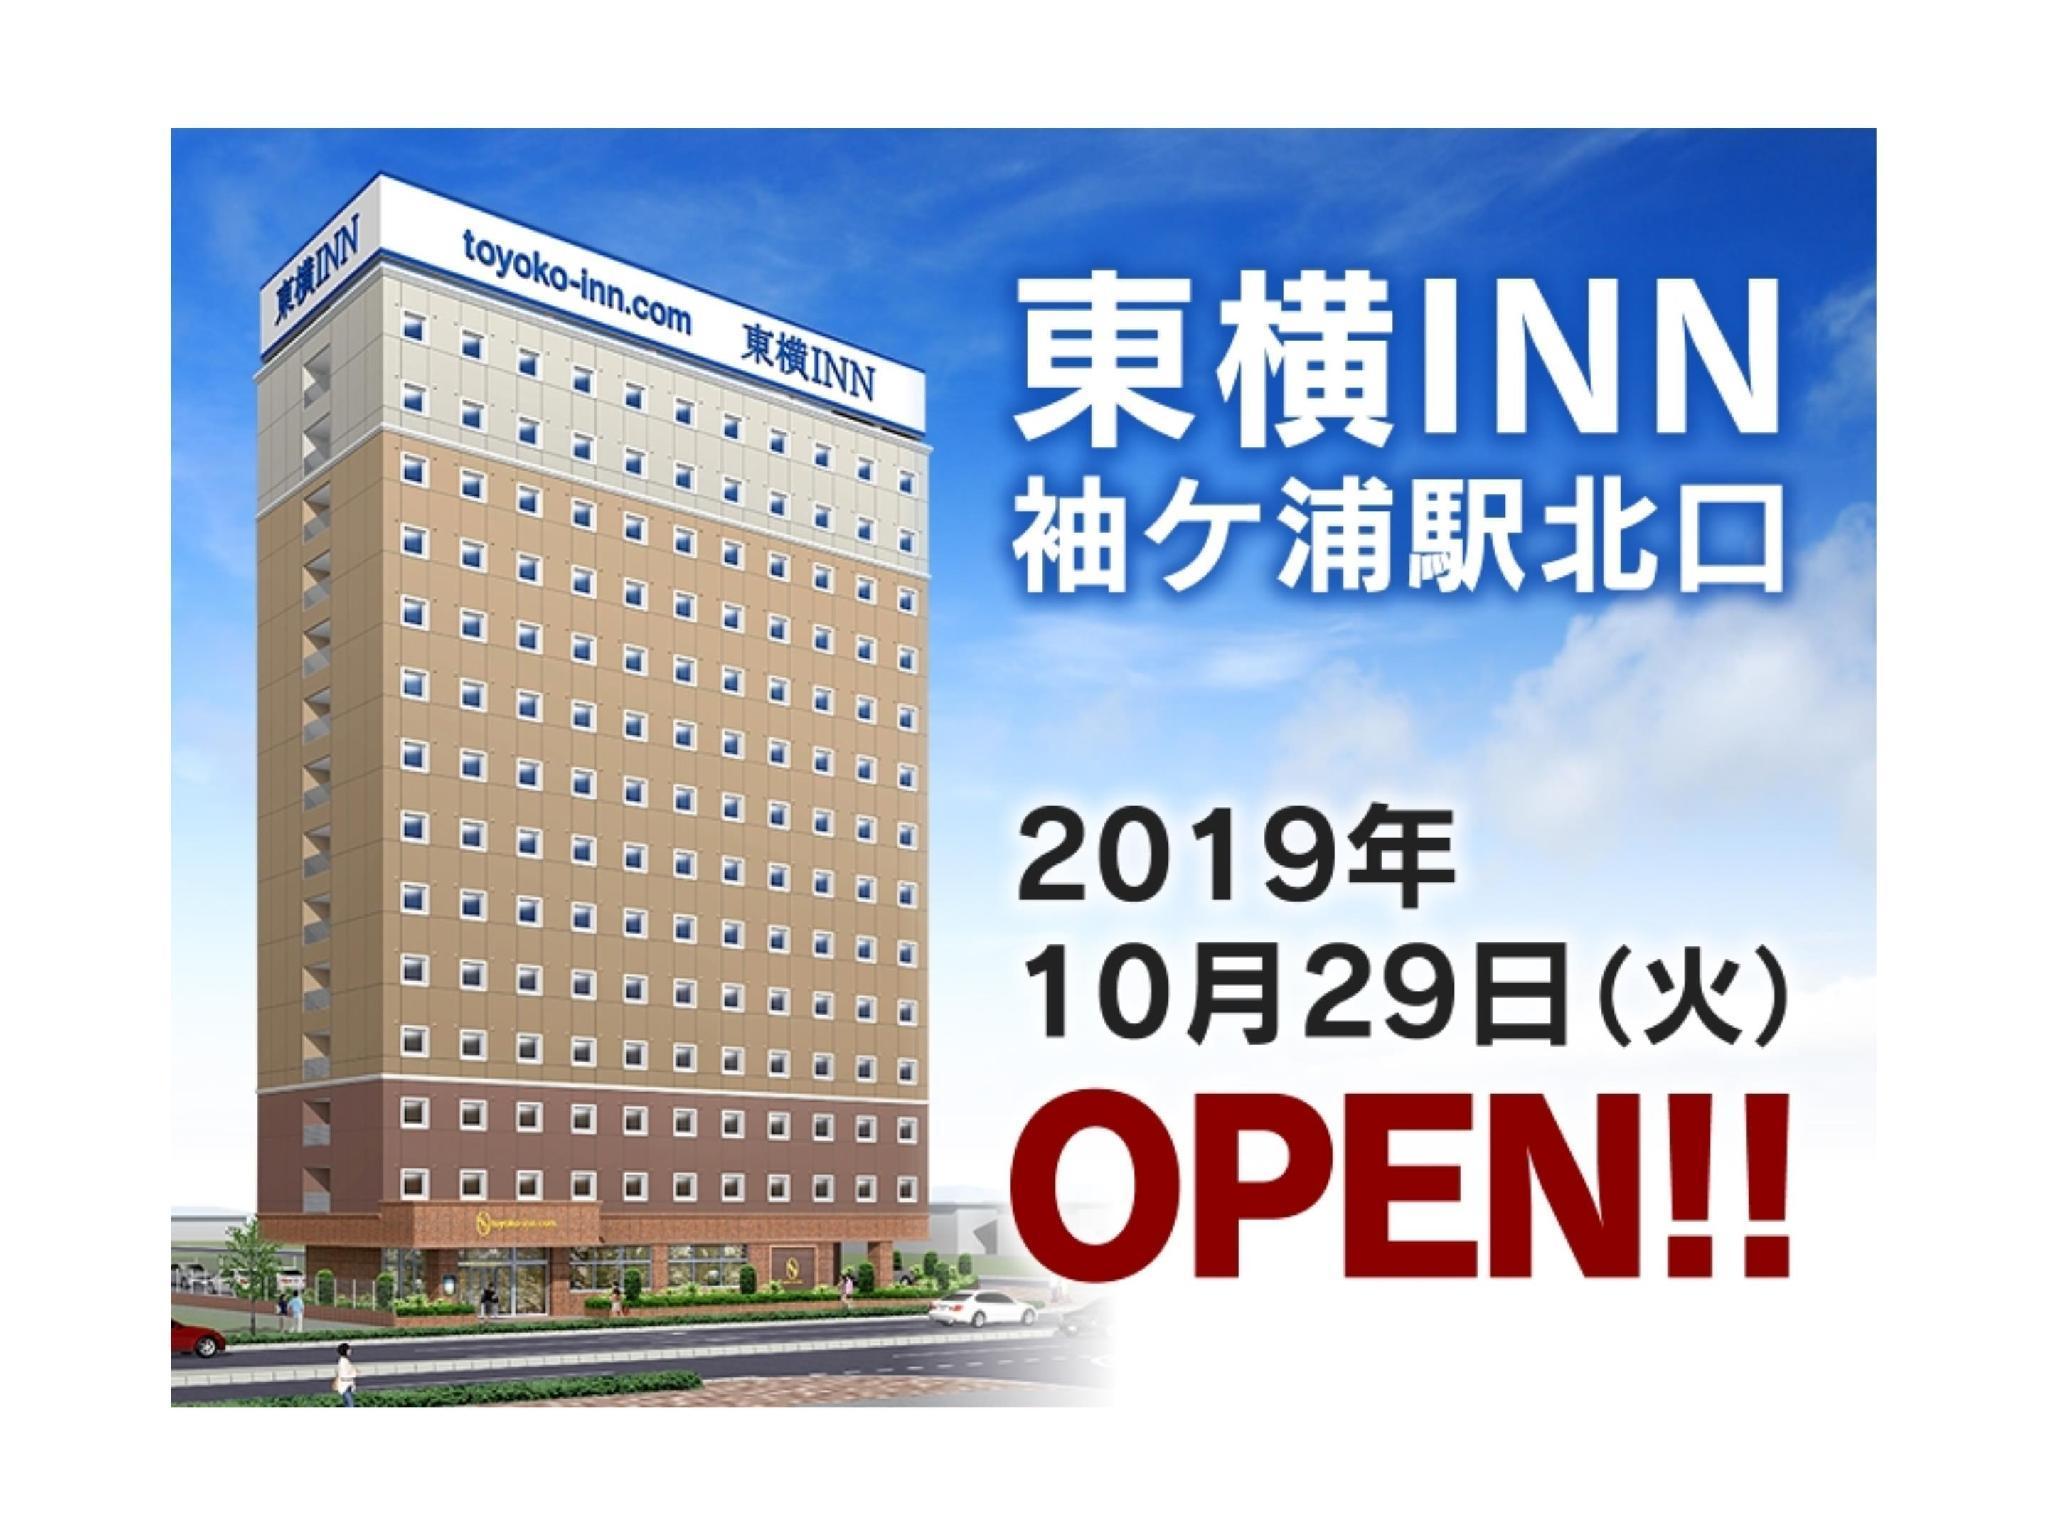 Toyoko Inn Sodegaura Eki Kita Guchi